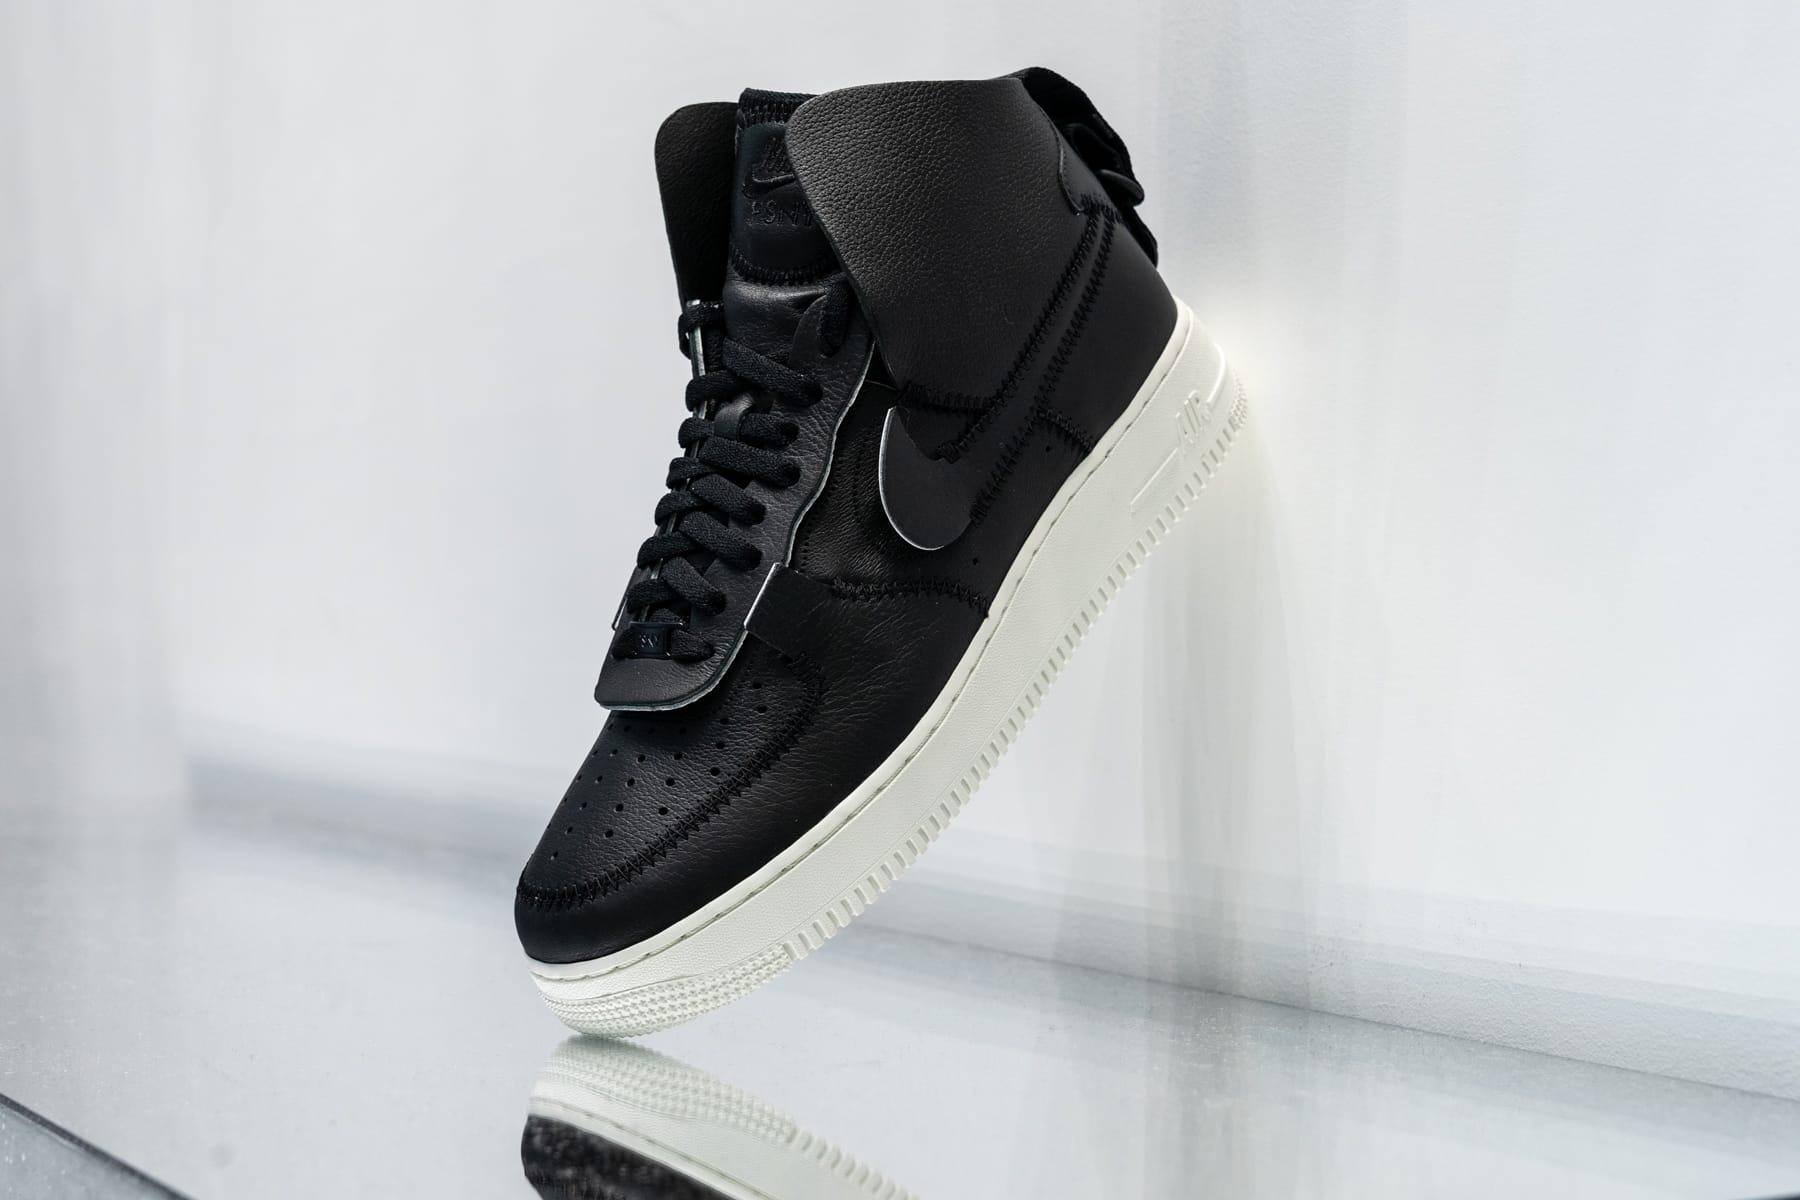 PSNY x Nike Air Force 1 Closer Look